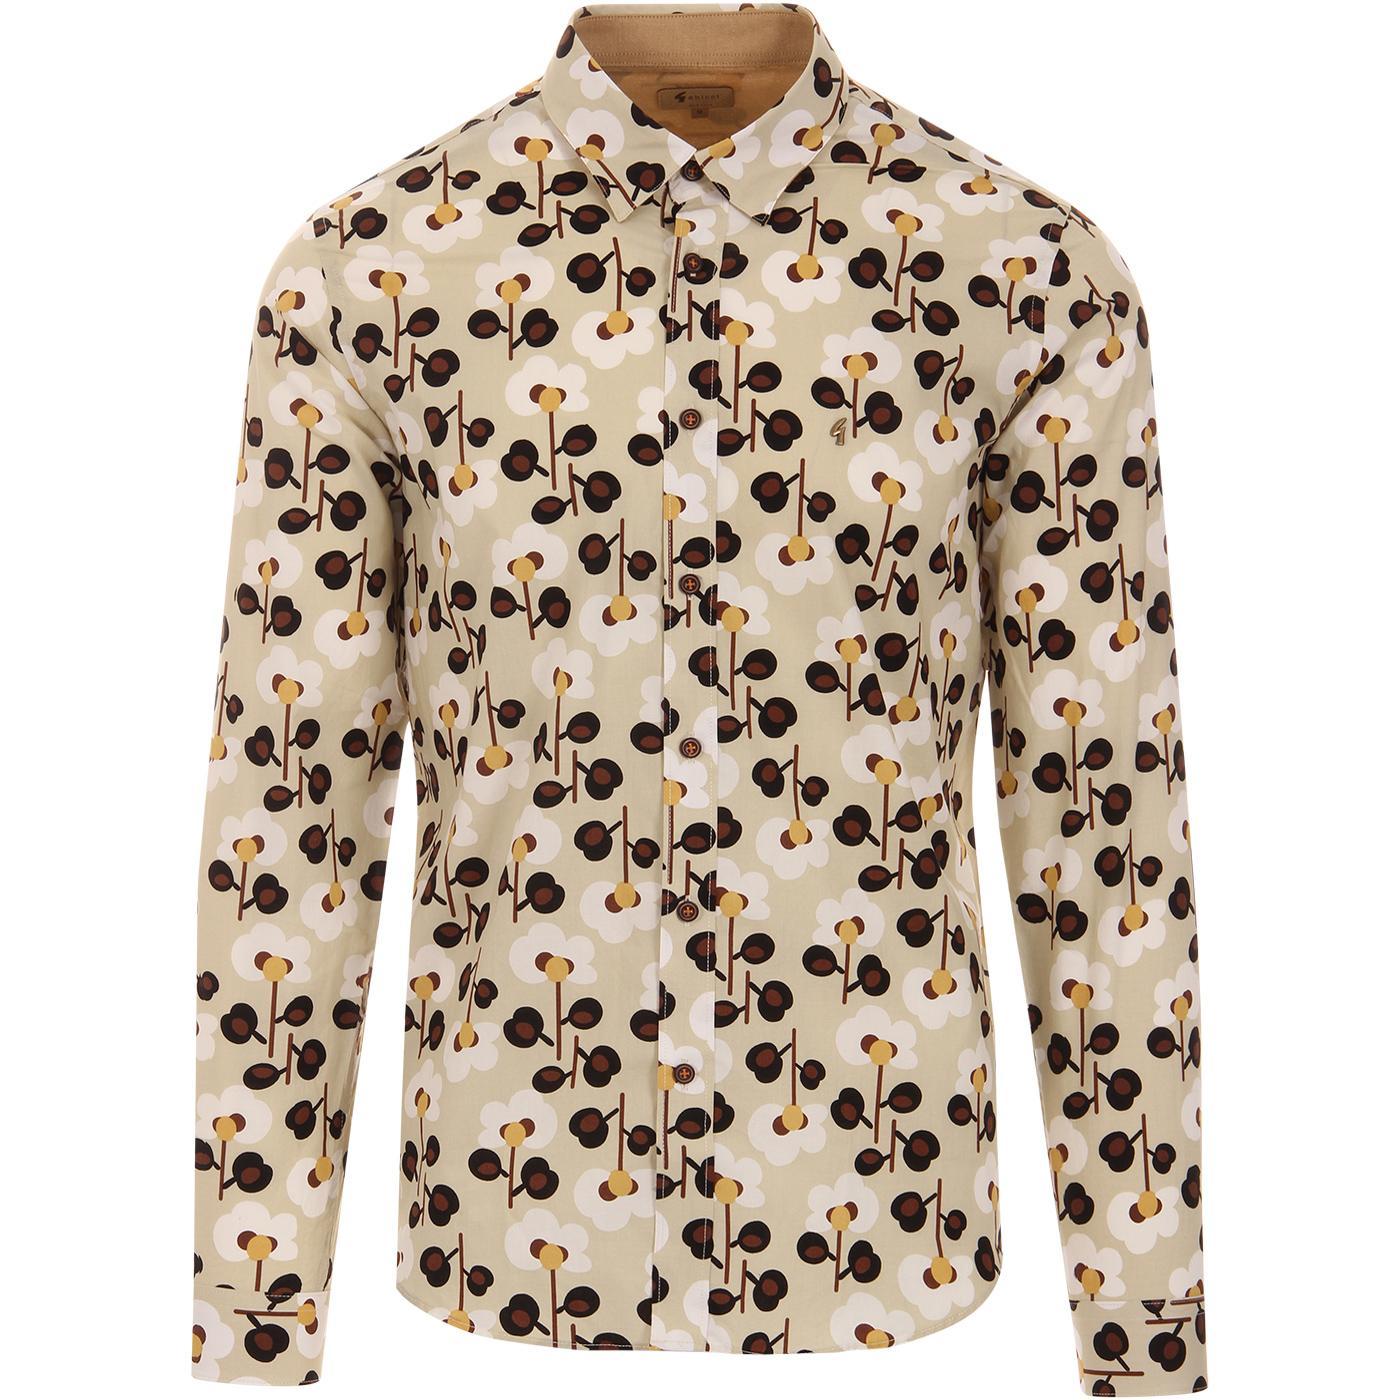 Nobu GABICCI VINTAGE 1960s Mod Floral Shirt (Oat)